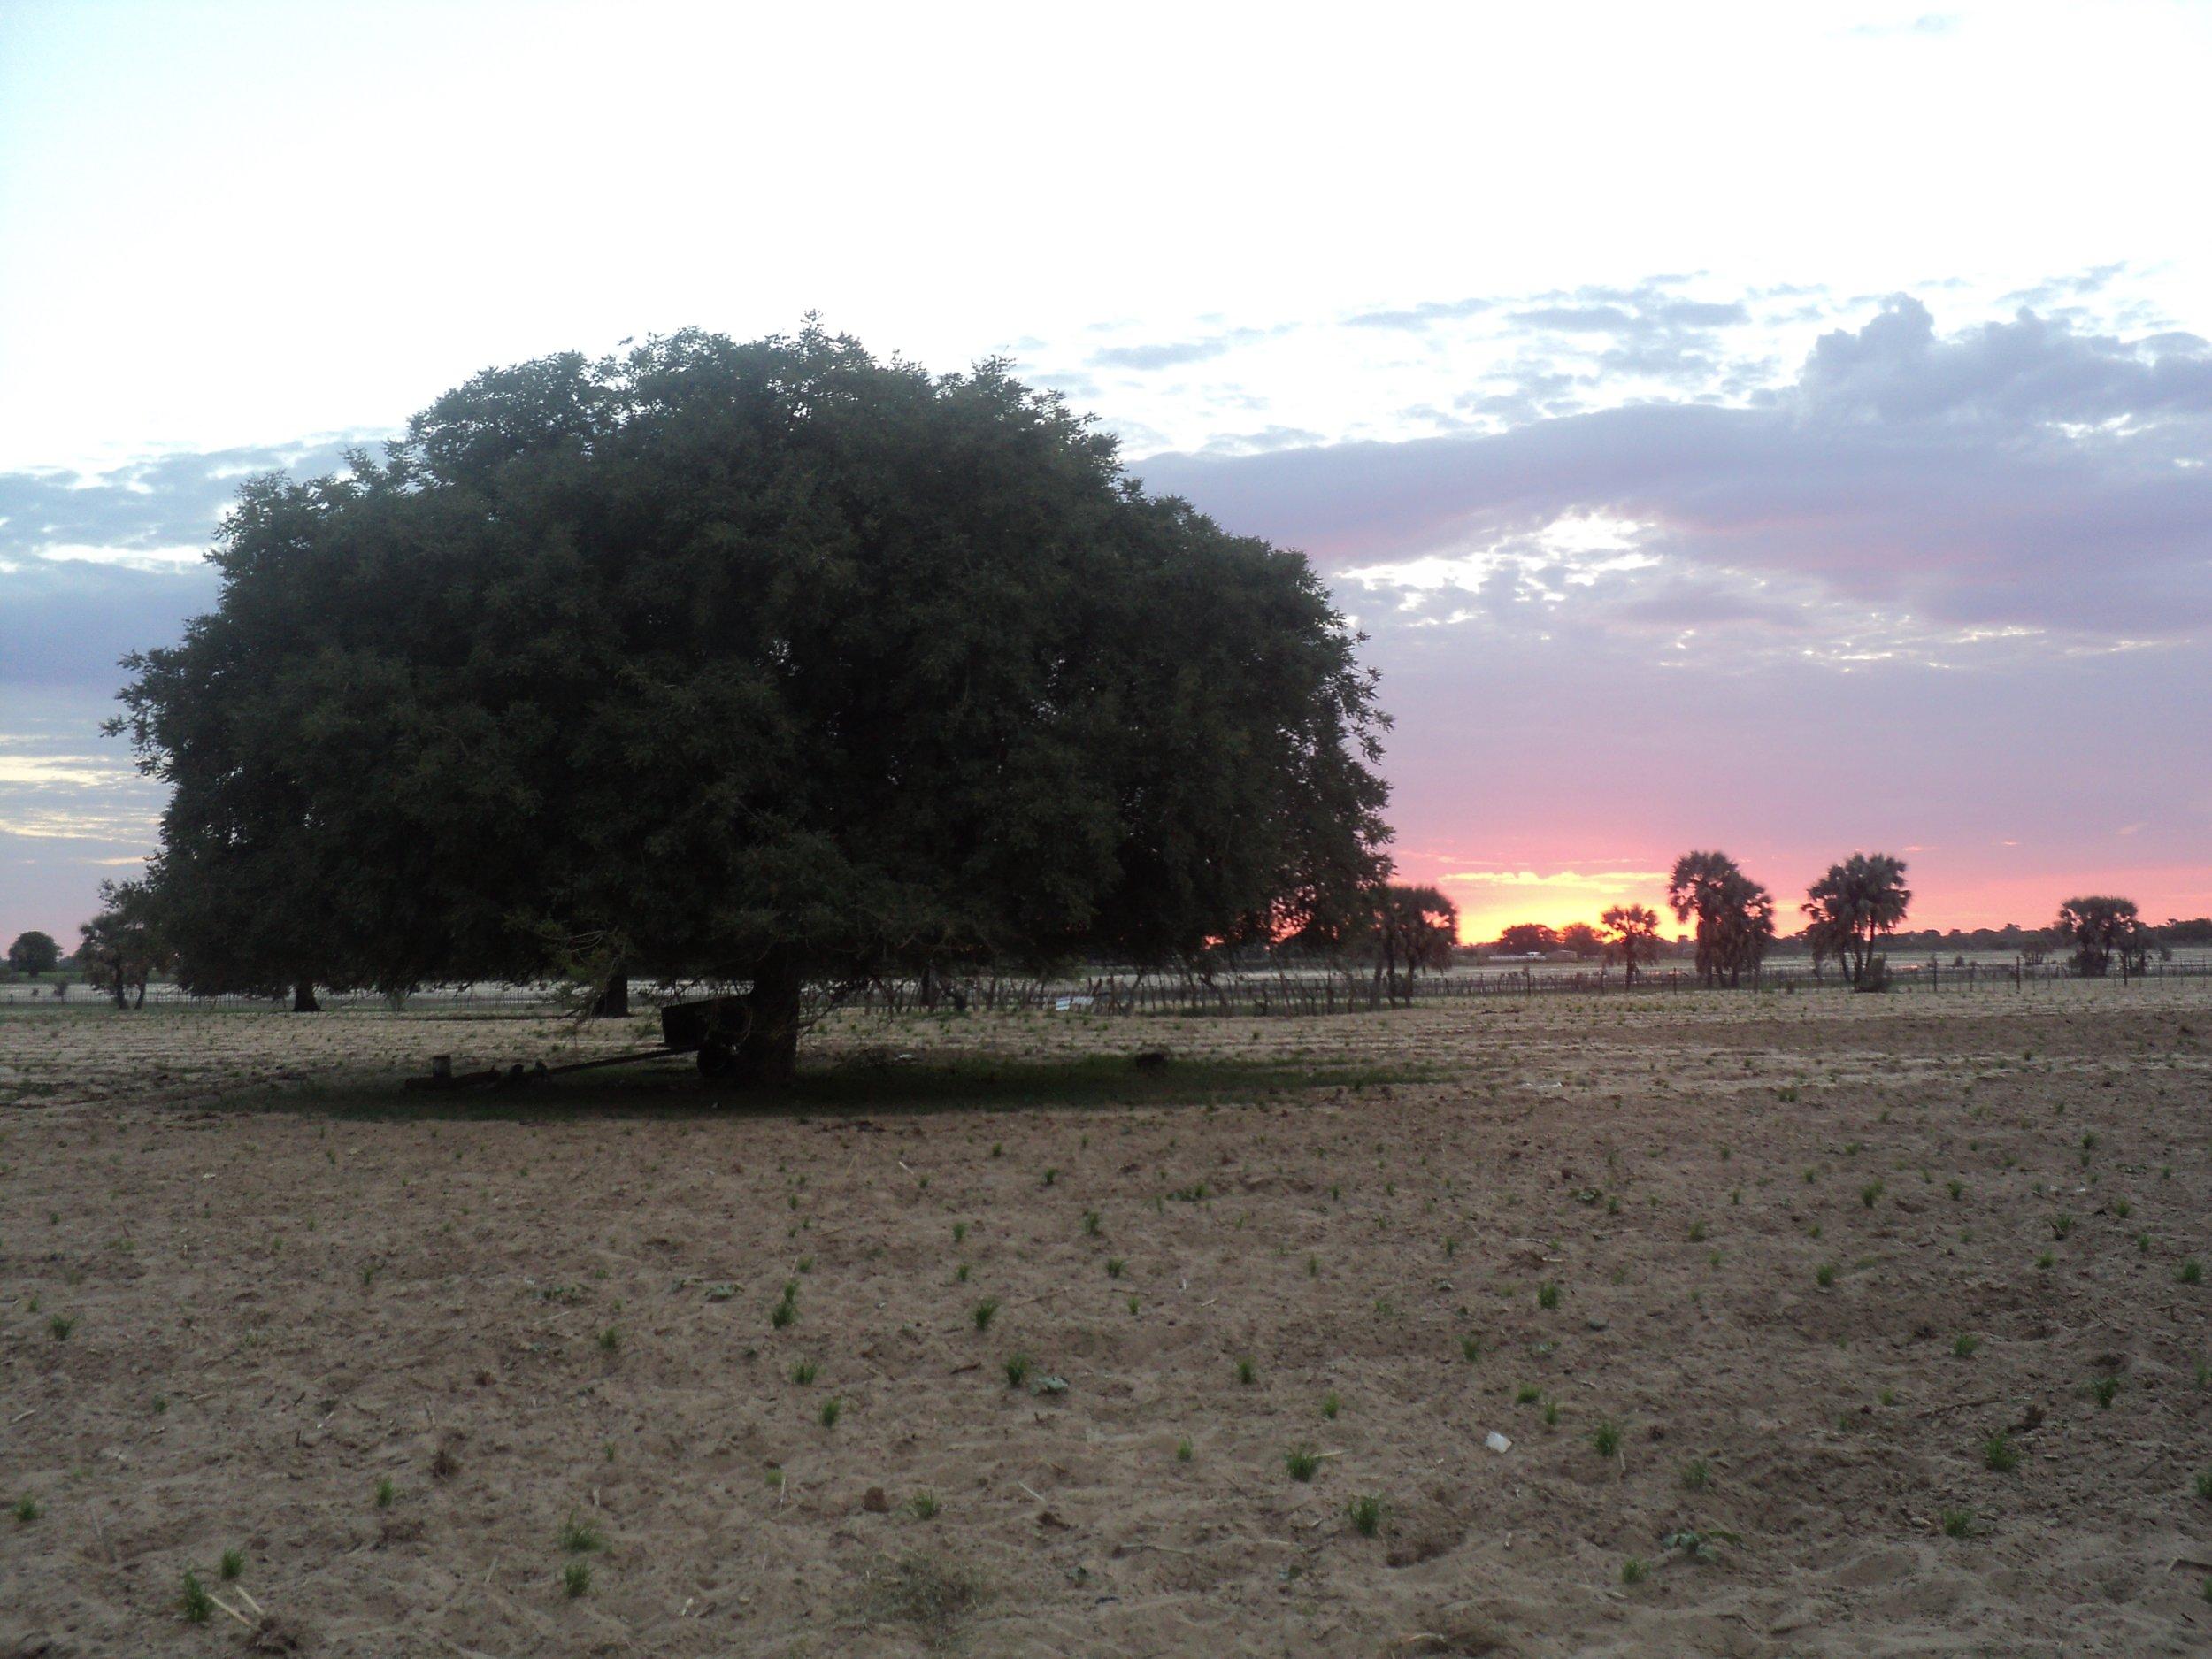 A Namibian marula tree.